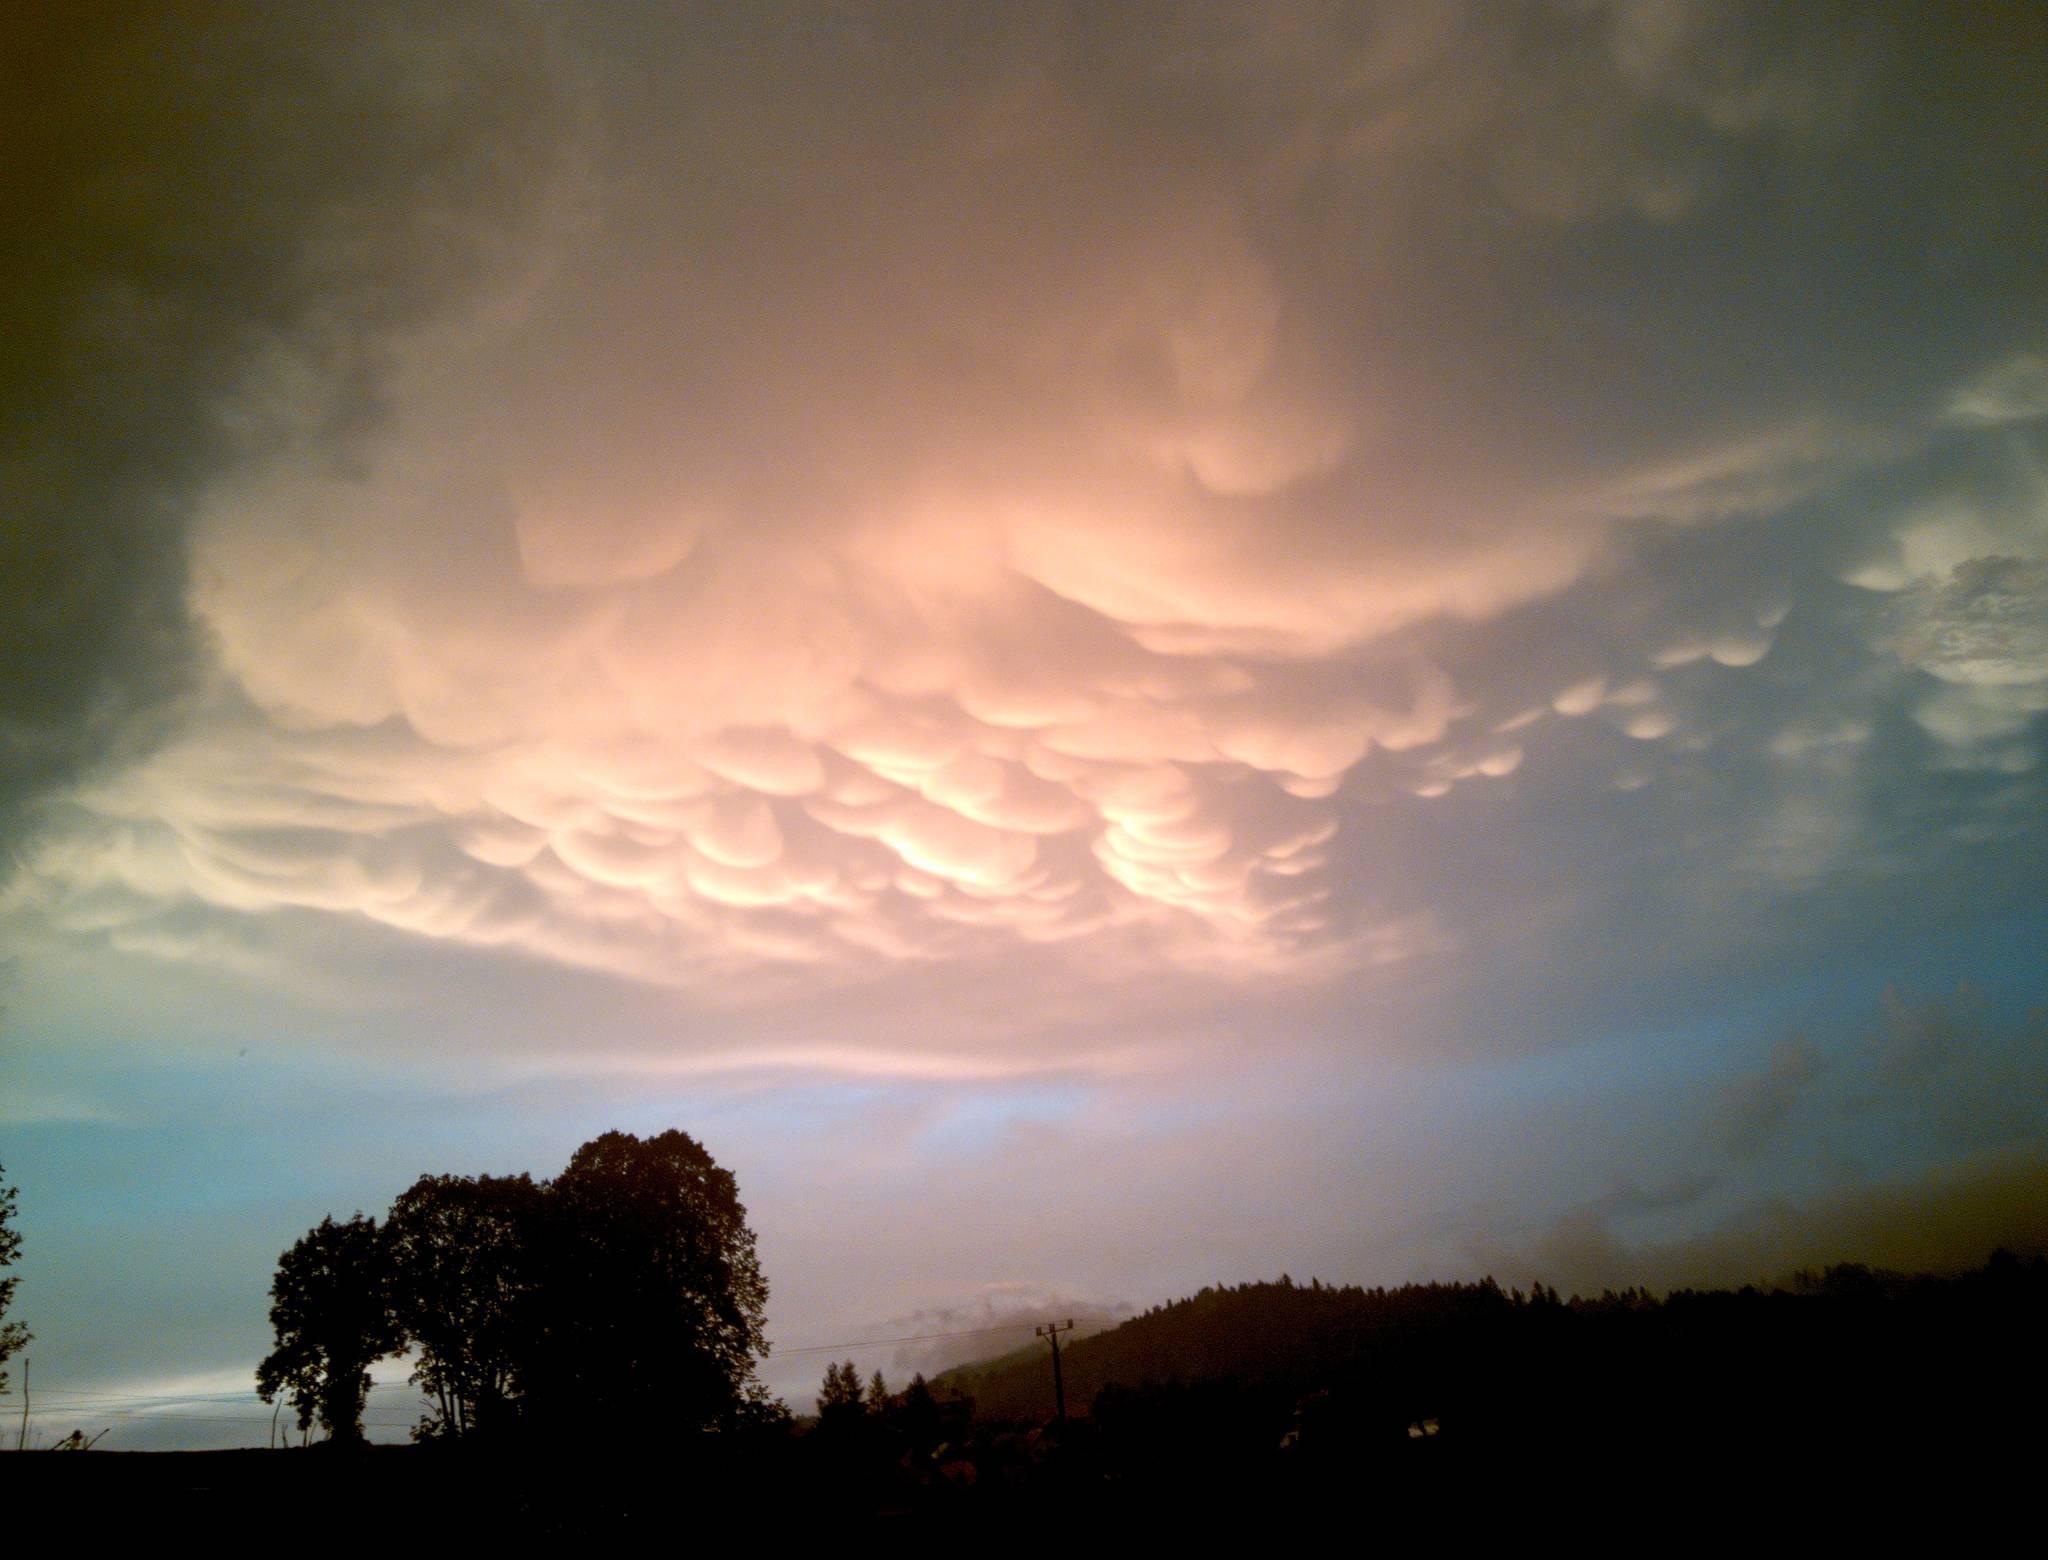 Piękne niebo po burzy.